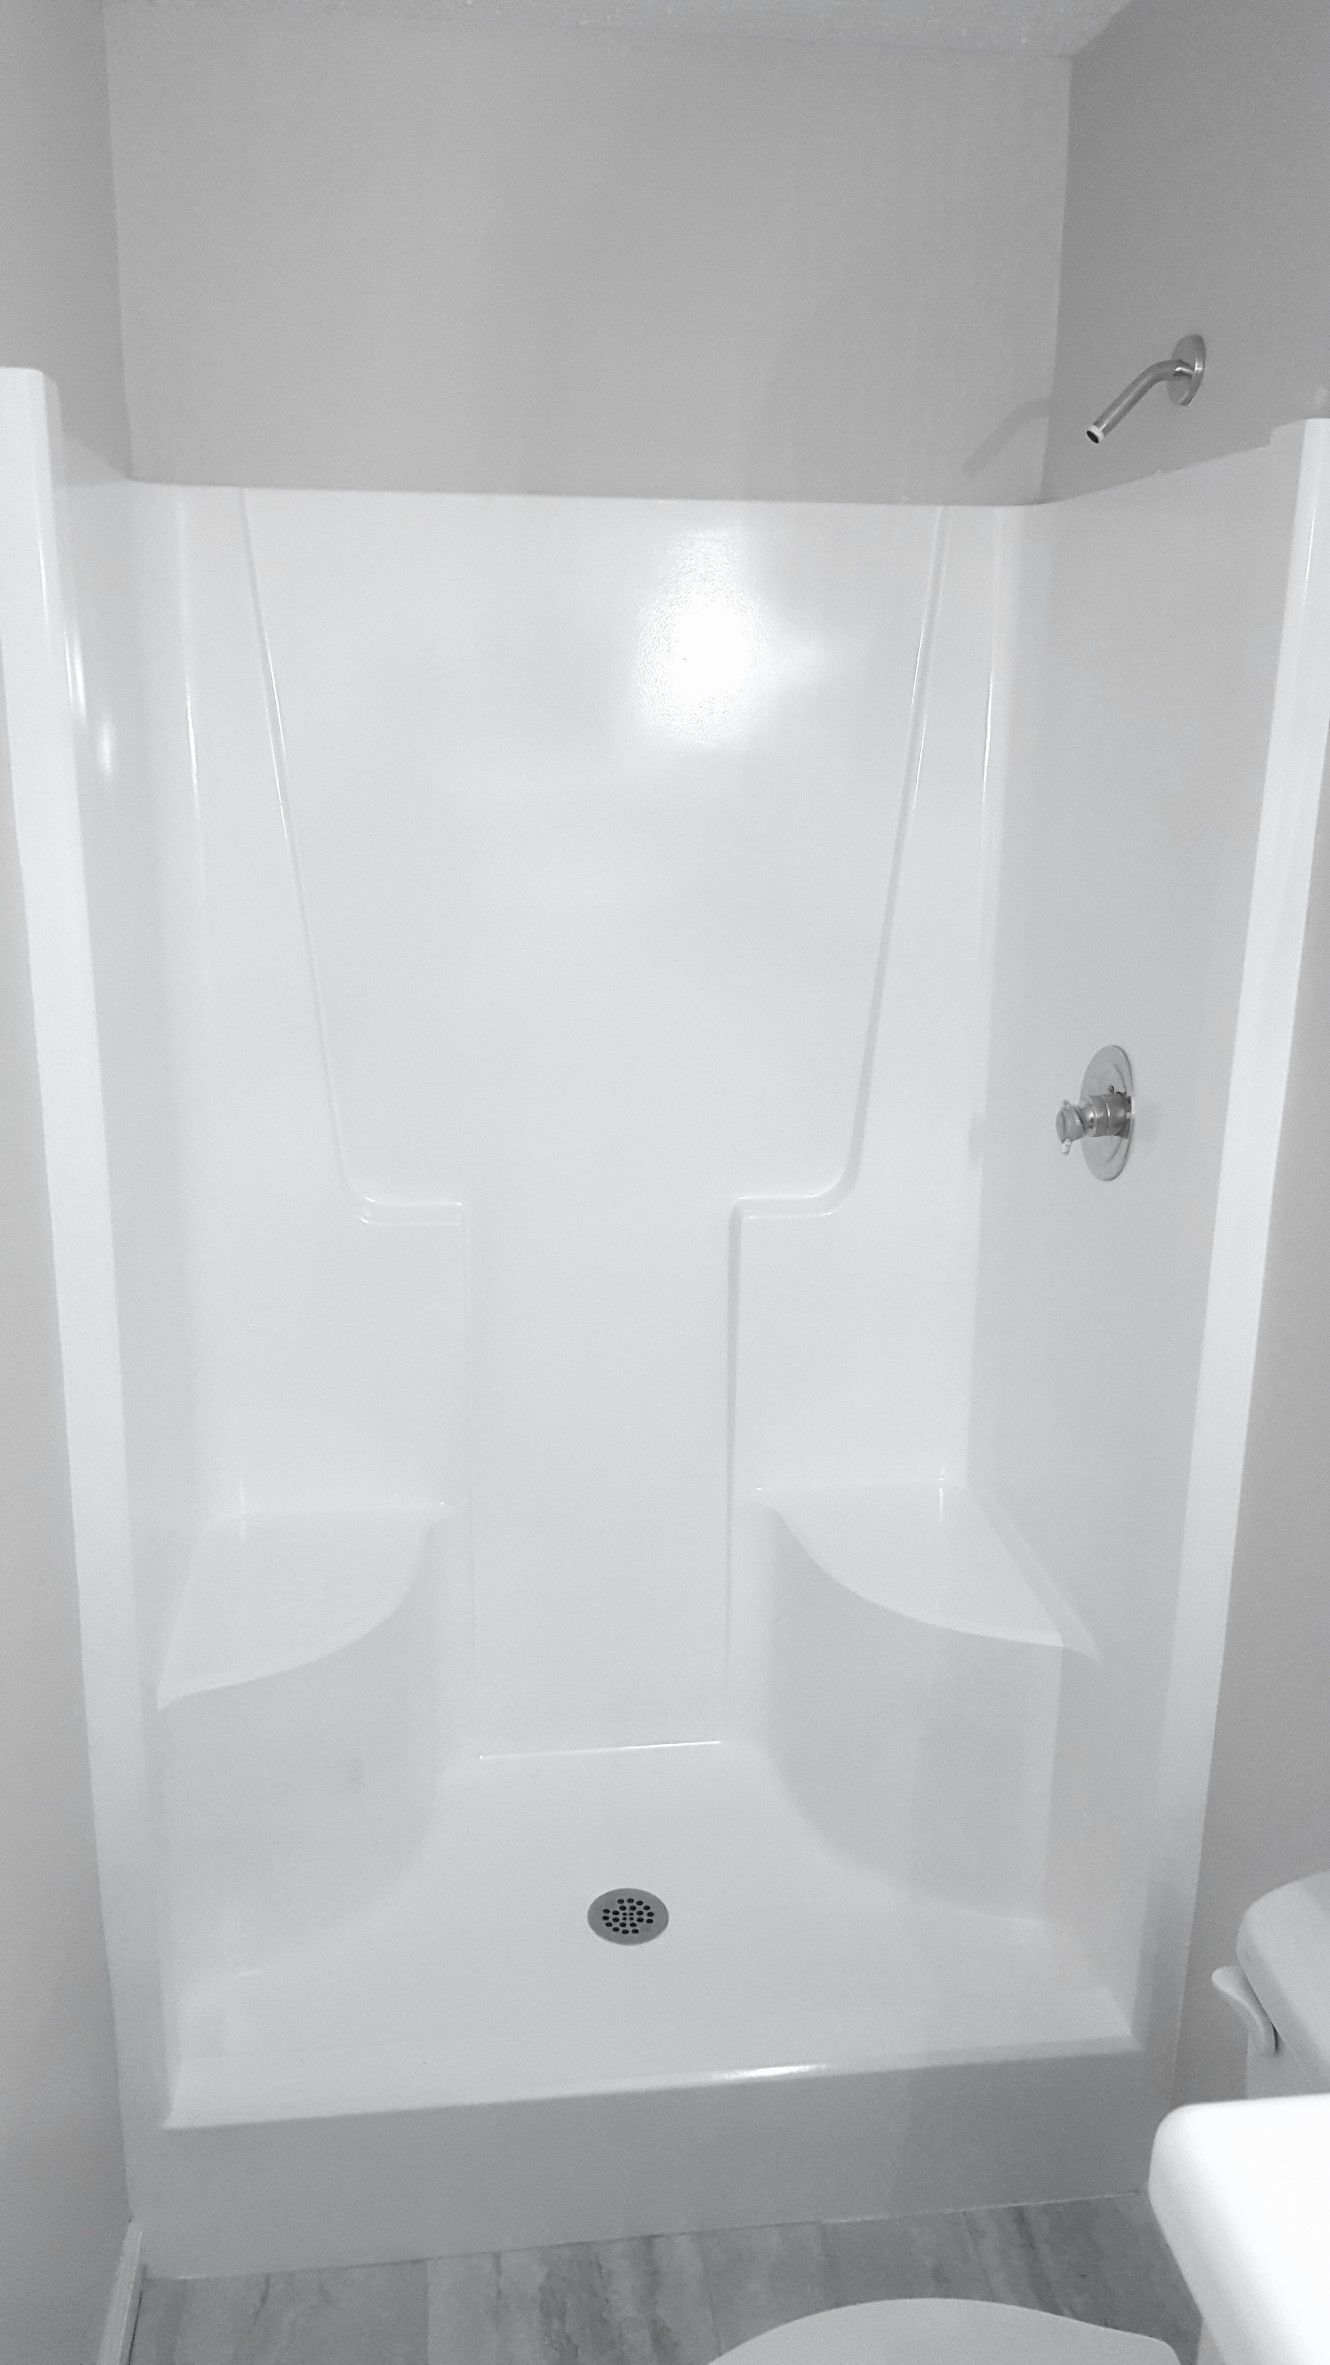 Voss job, Piccot Refinishing, Acrylic Shower Stall Refinishing ...